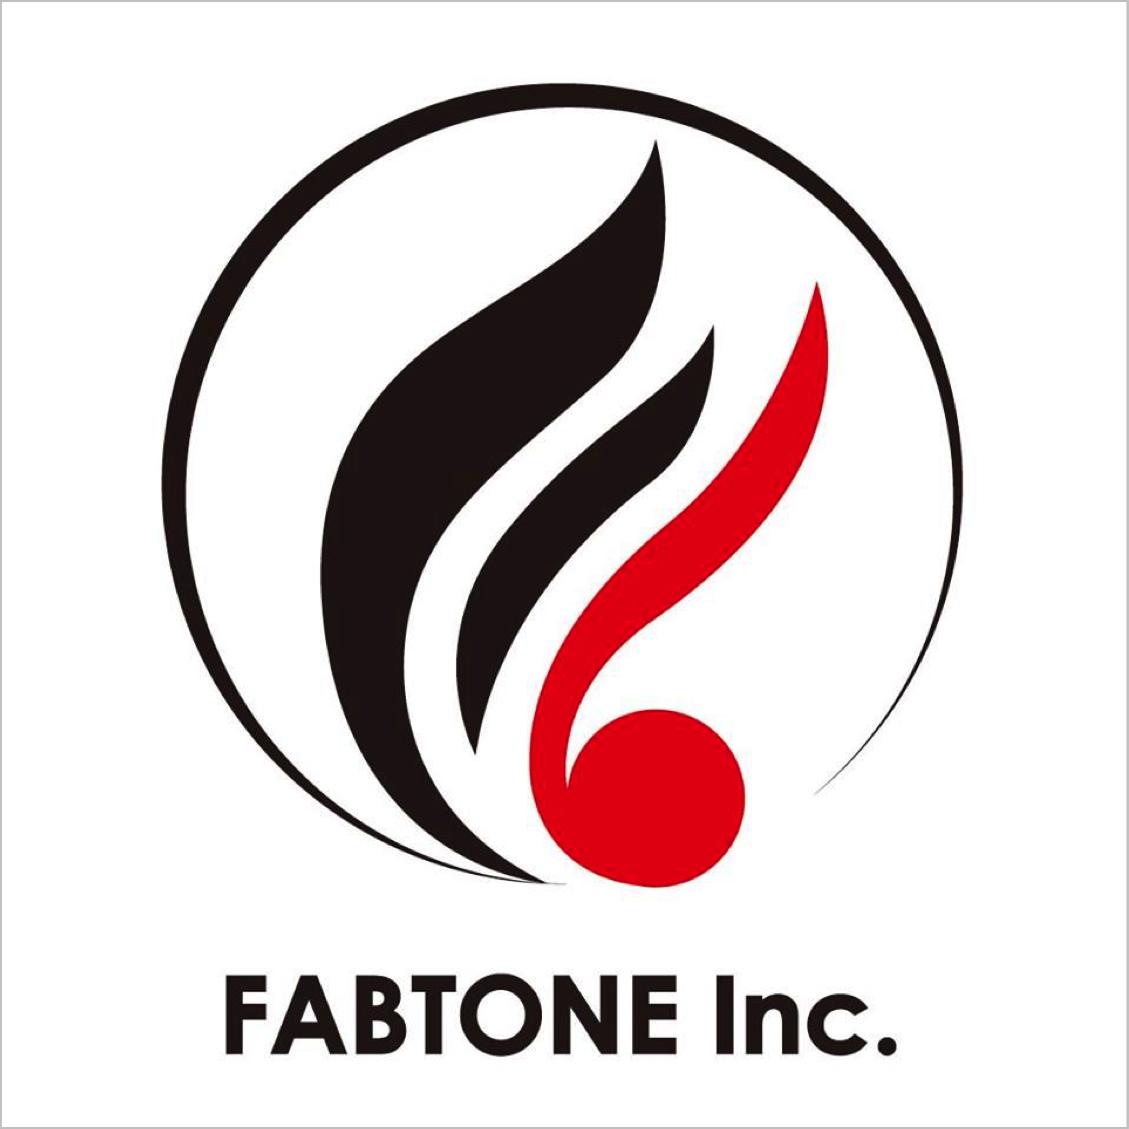 FABTONE